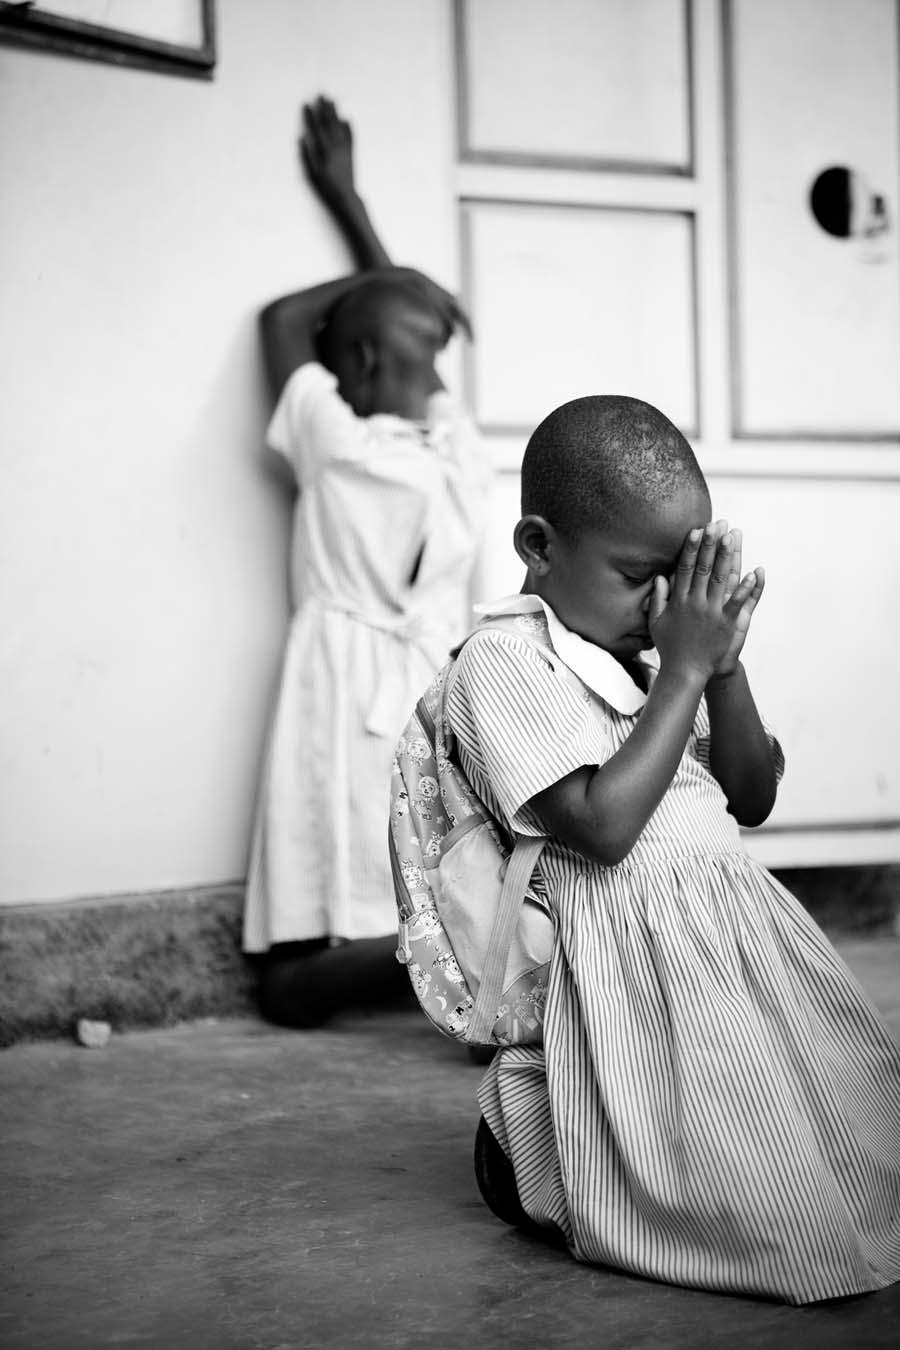 jessicadavisphotography.com | Jessica Davis Photography | Portrait Work in Uganda| Travel Photographer | World Event Photographs 2 (9).jpg